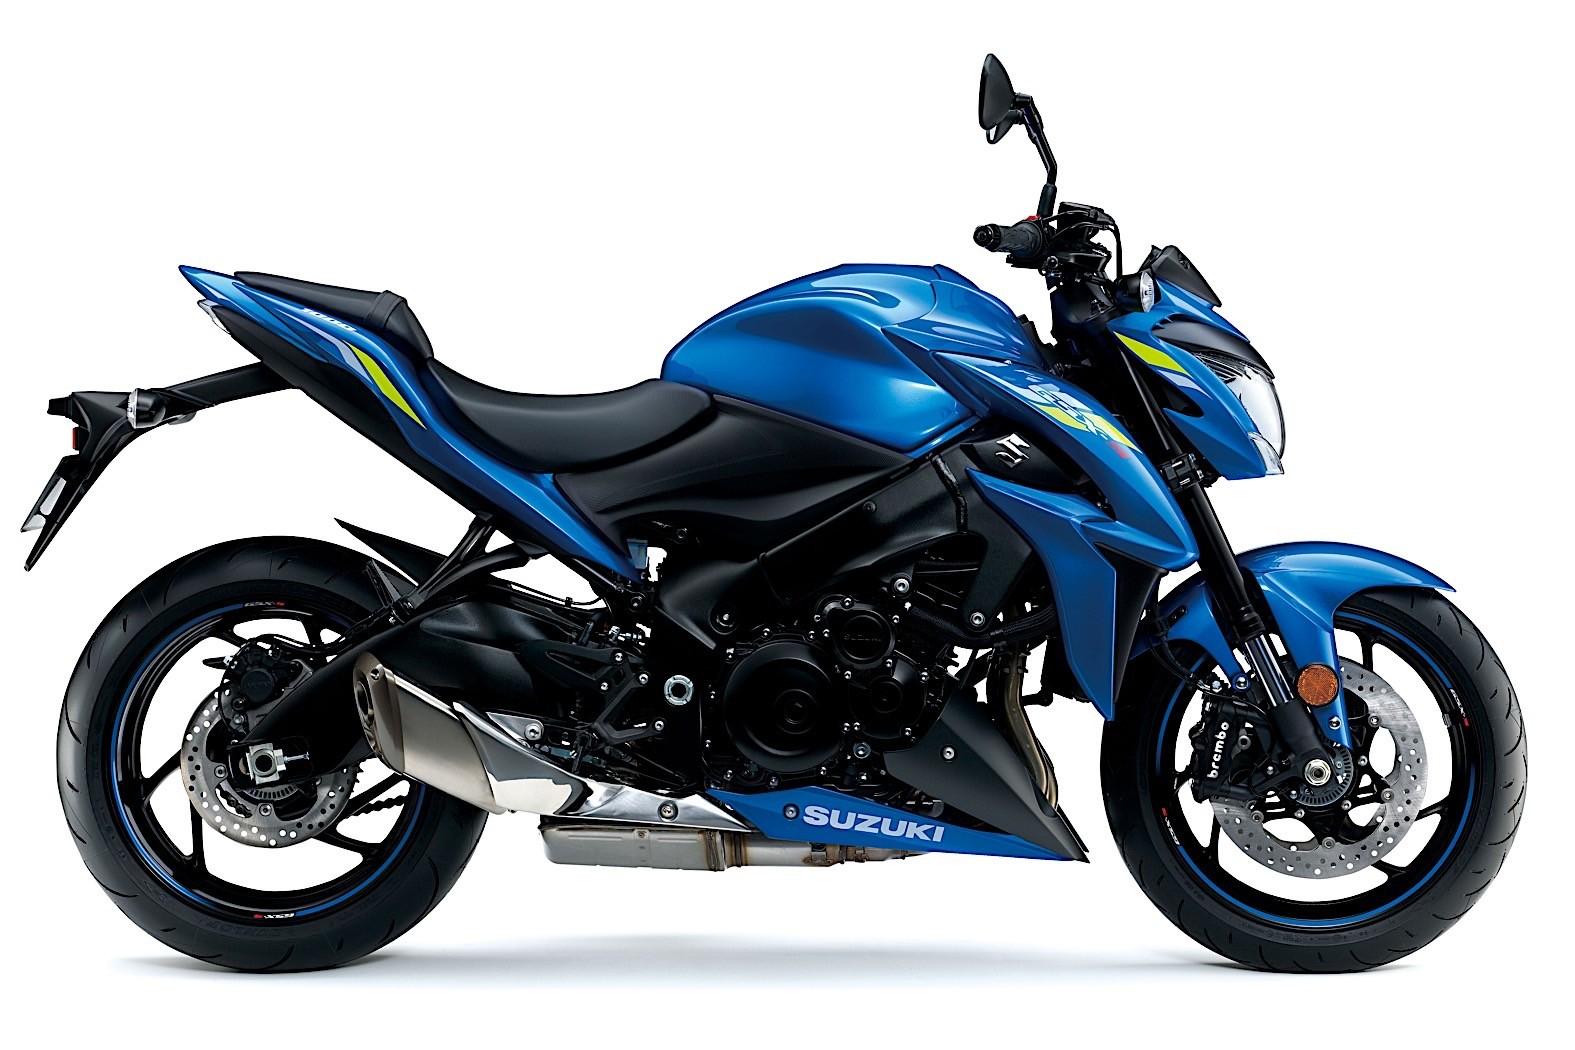 suzuki motorcycles motorcycle colors shine live autoevolution company